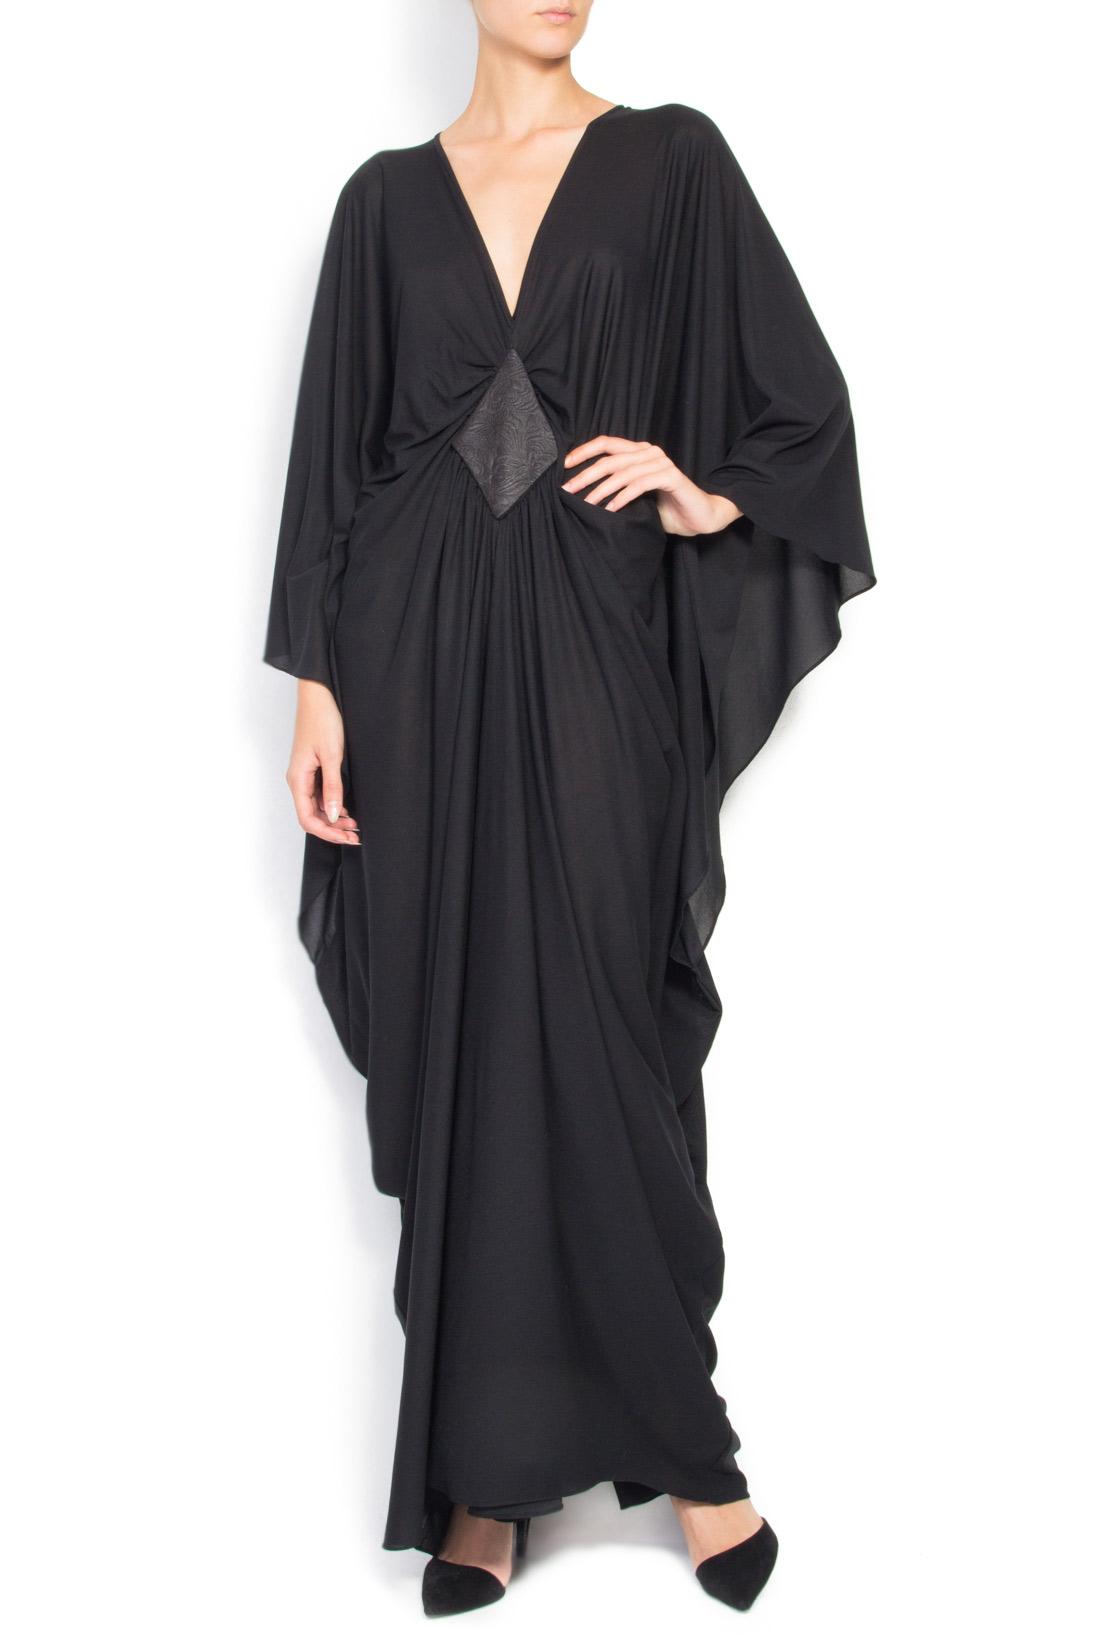 f3885da8089 Black jersey maxi dress - Maxi Dresses made to measure